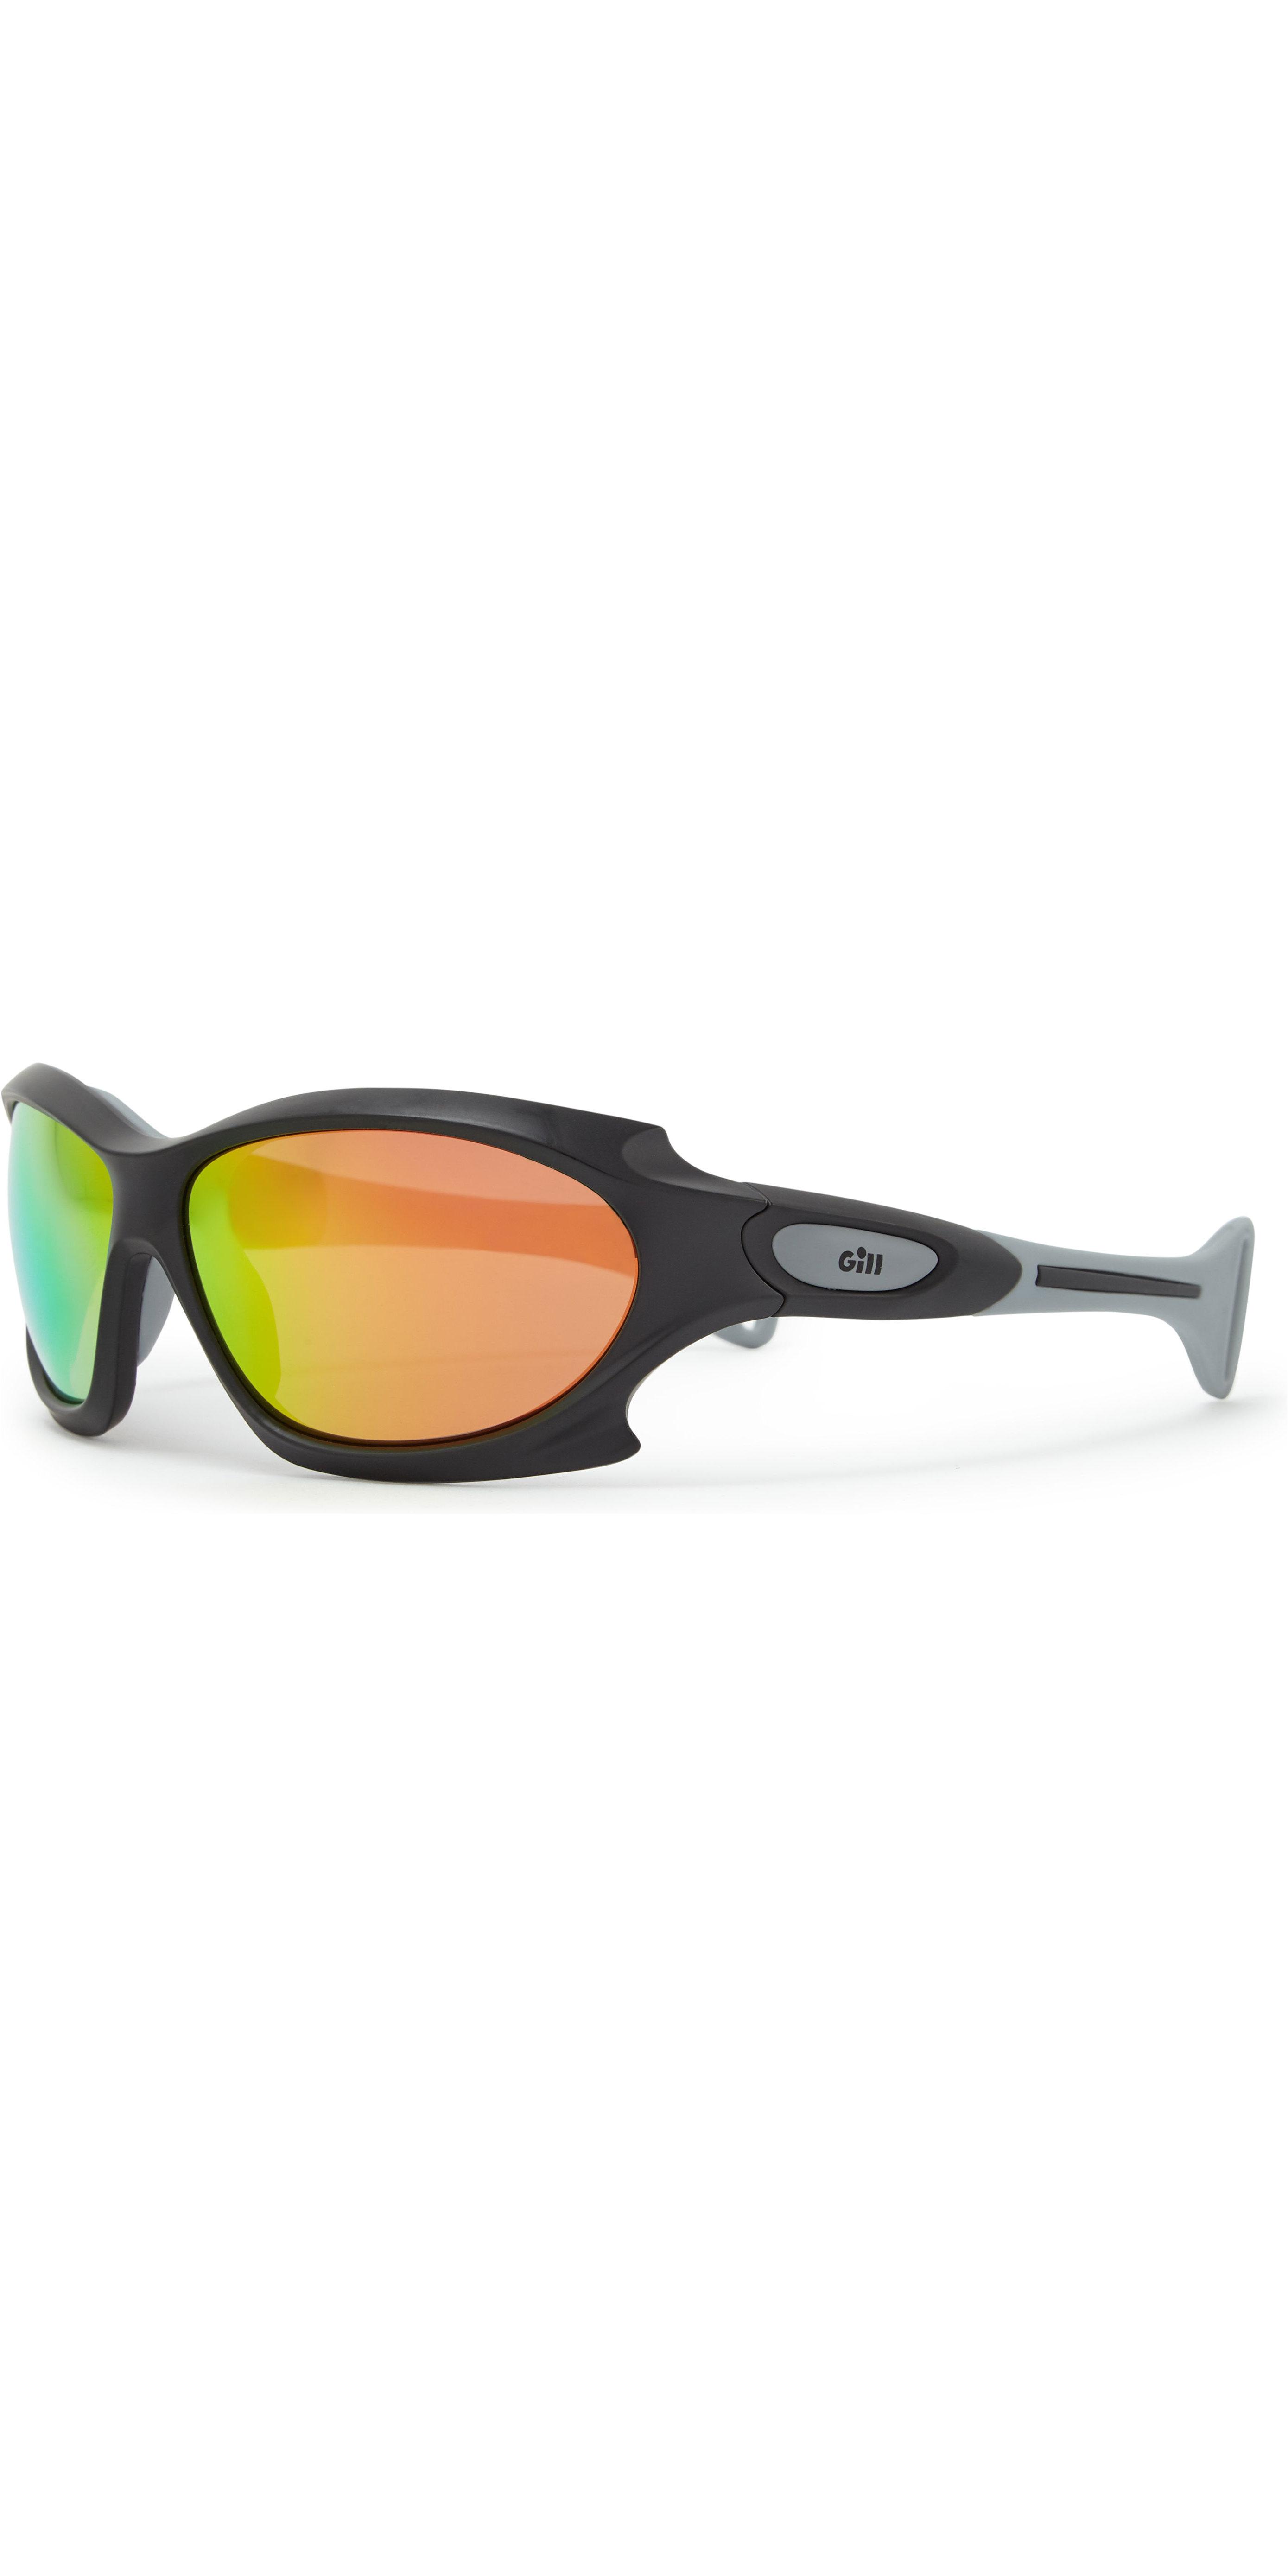 14db8fa202c 2019 Gill Race Ocean Sunglasses Black Orange Rs27 - Mens Sunglasses -  Sunglasses - by Gill